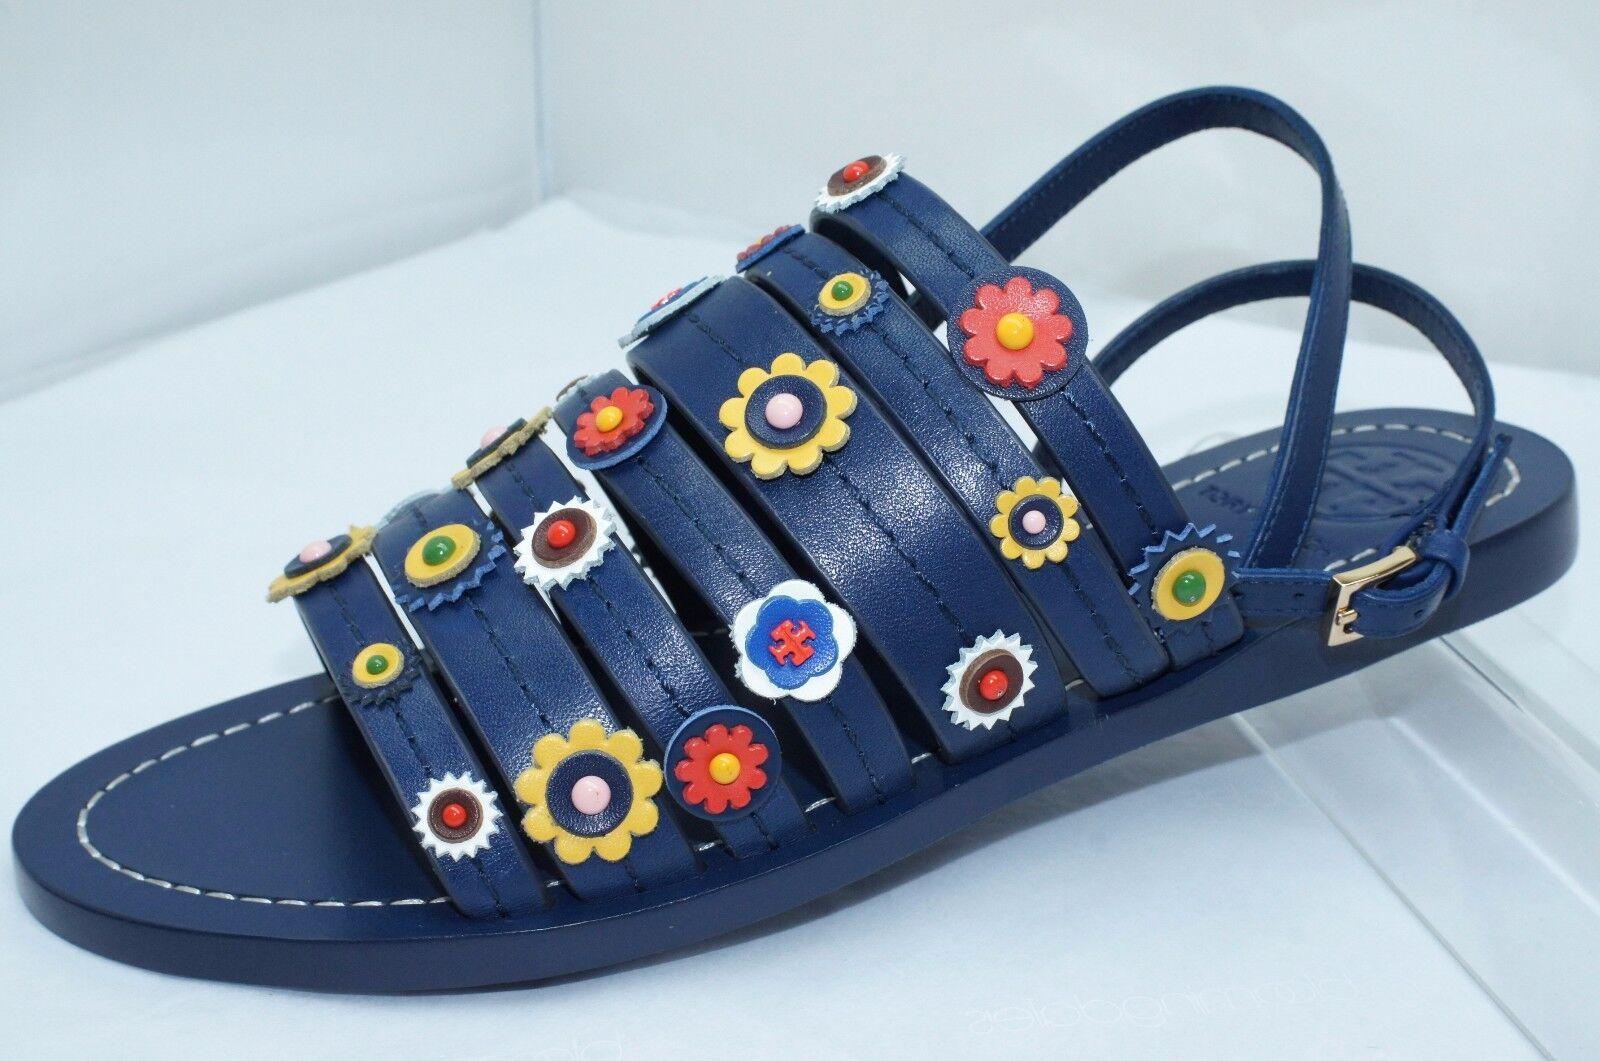 68827e189 Tory Burch Marguerite Flat Sandals Shoes Size 7.5 Blue Navy Sea ...